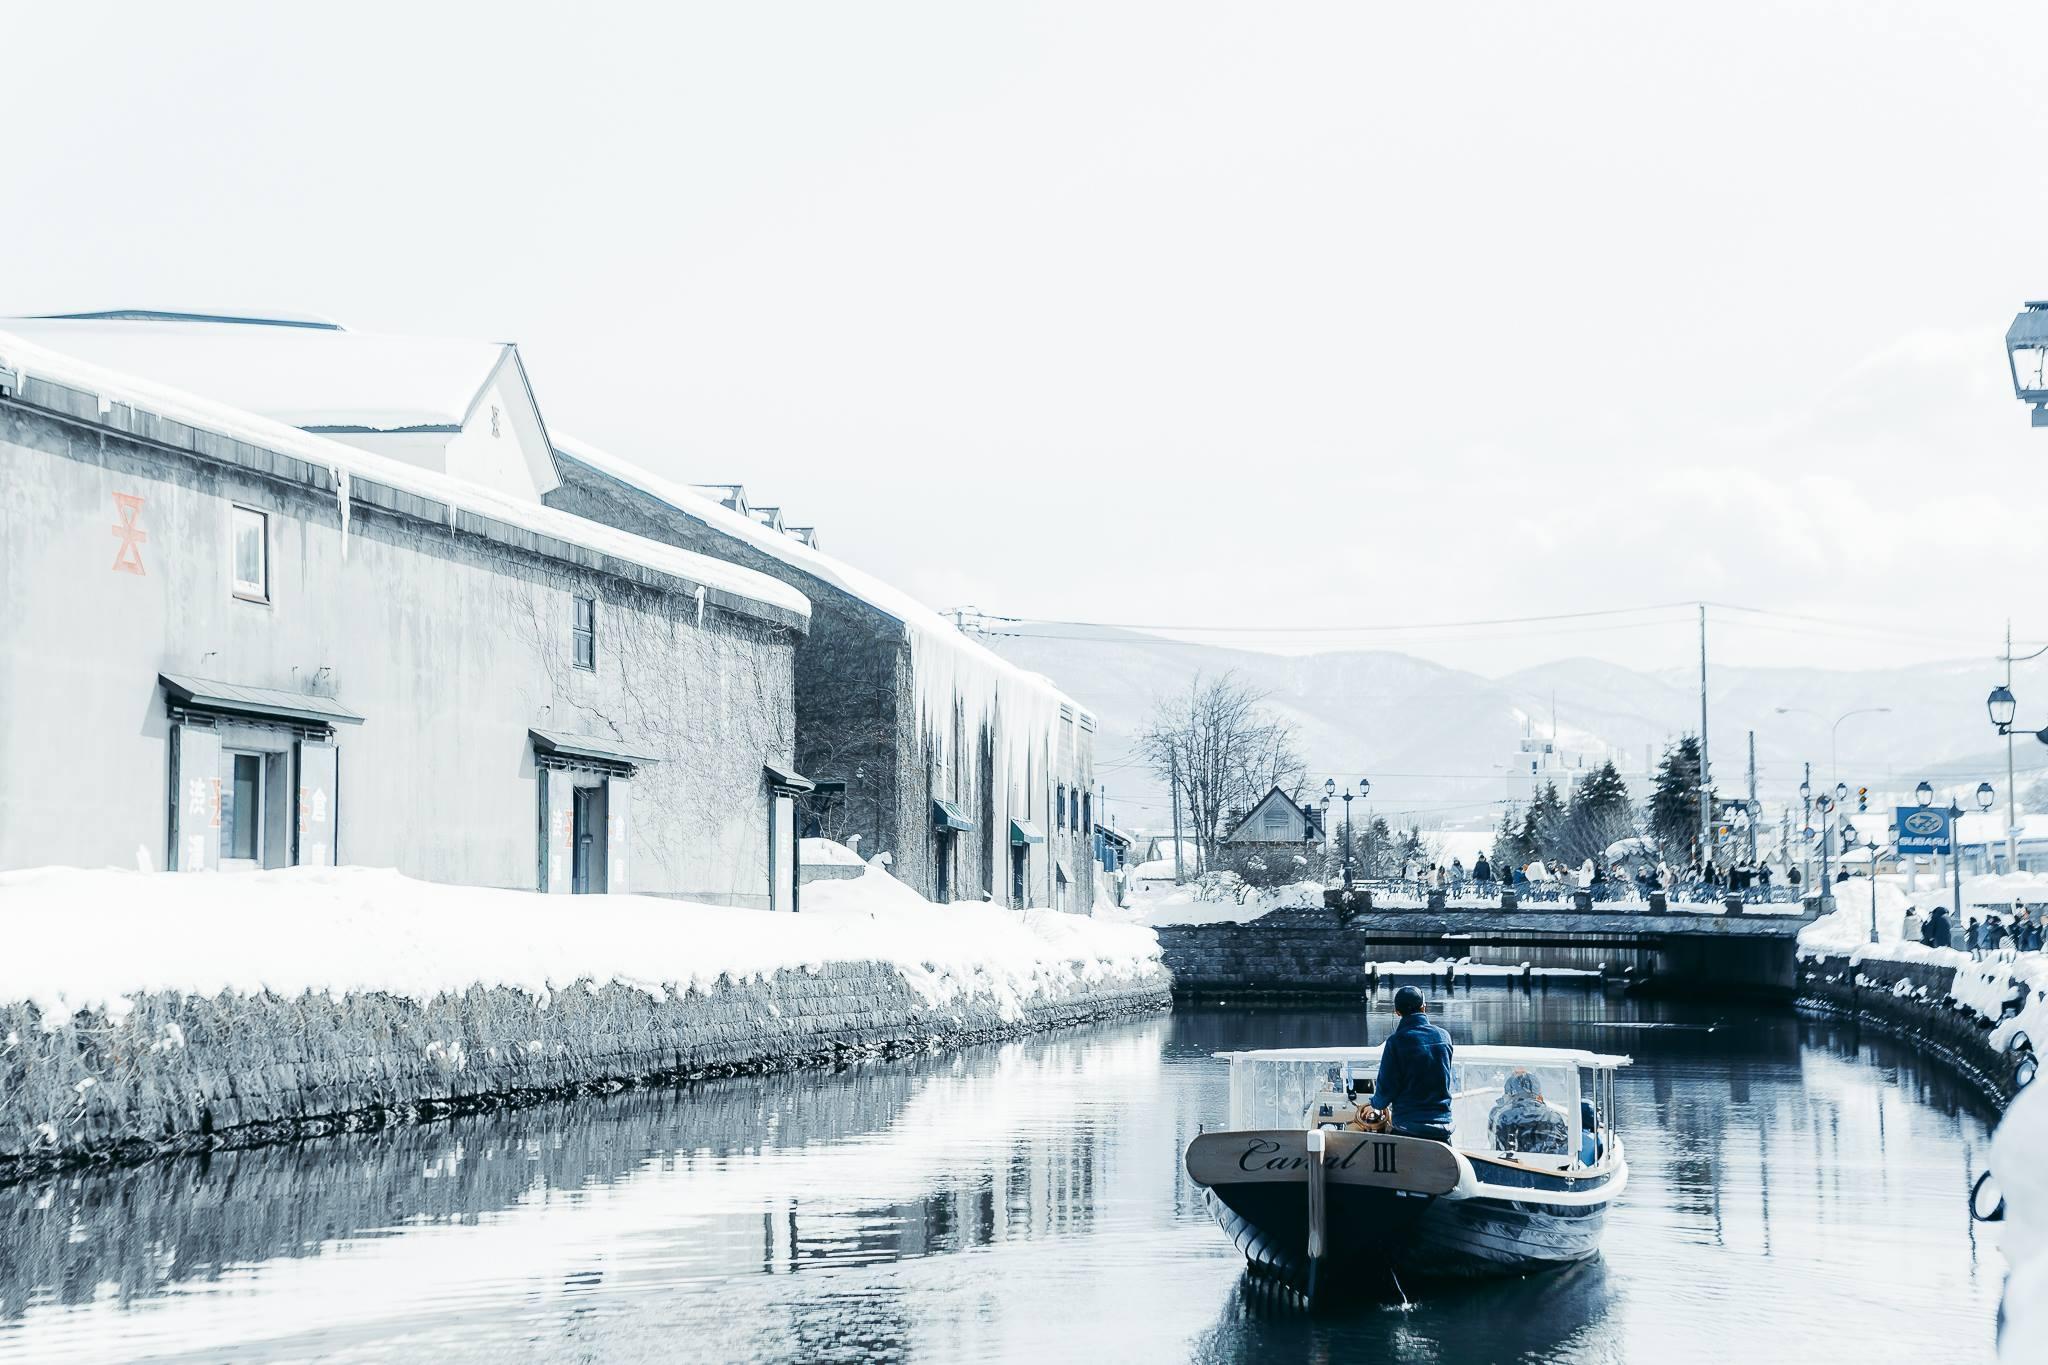 Hokkaido tuyet trang, noi dang den nhat mua dong o Nhat Ban hinh anh 27